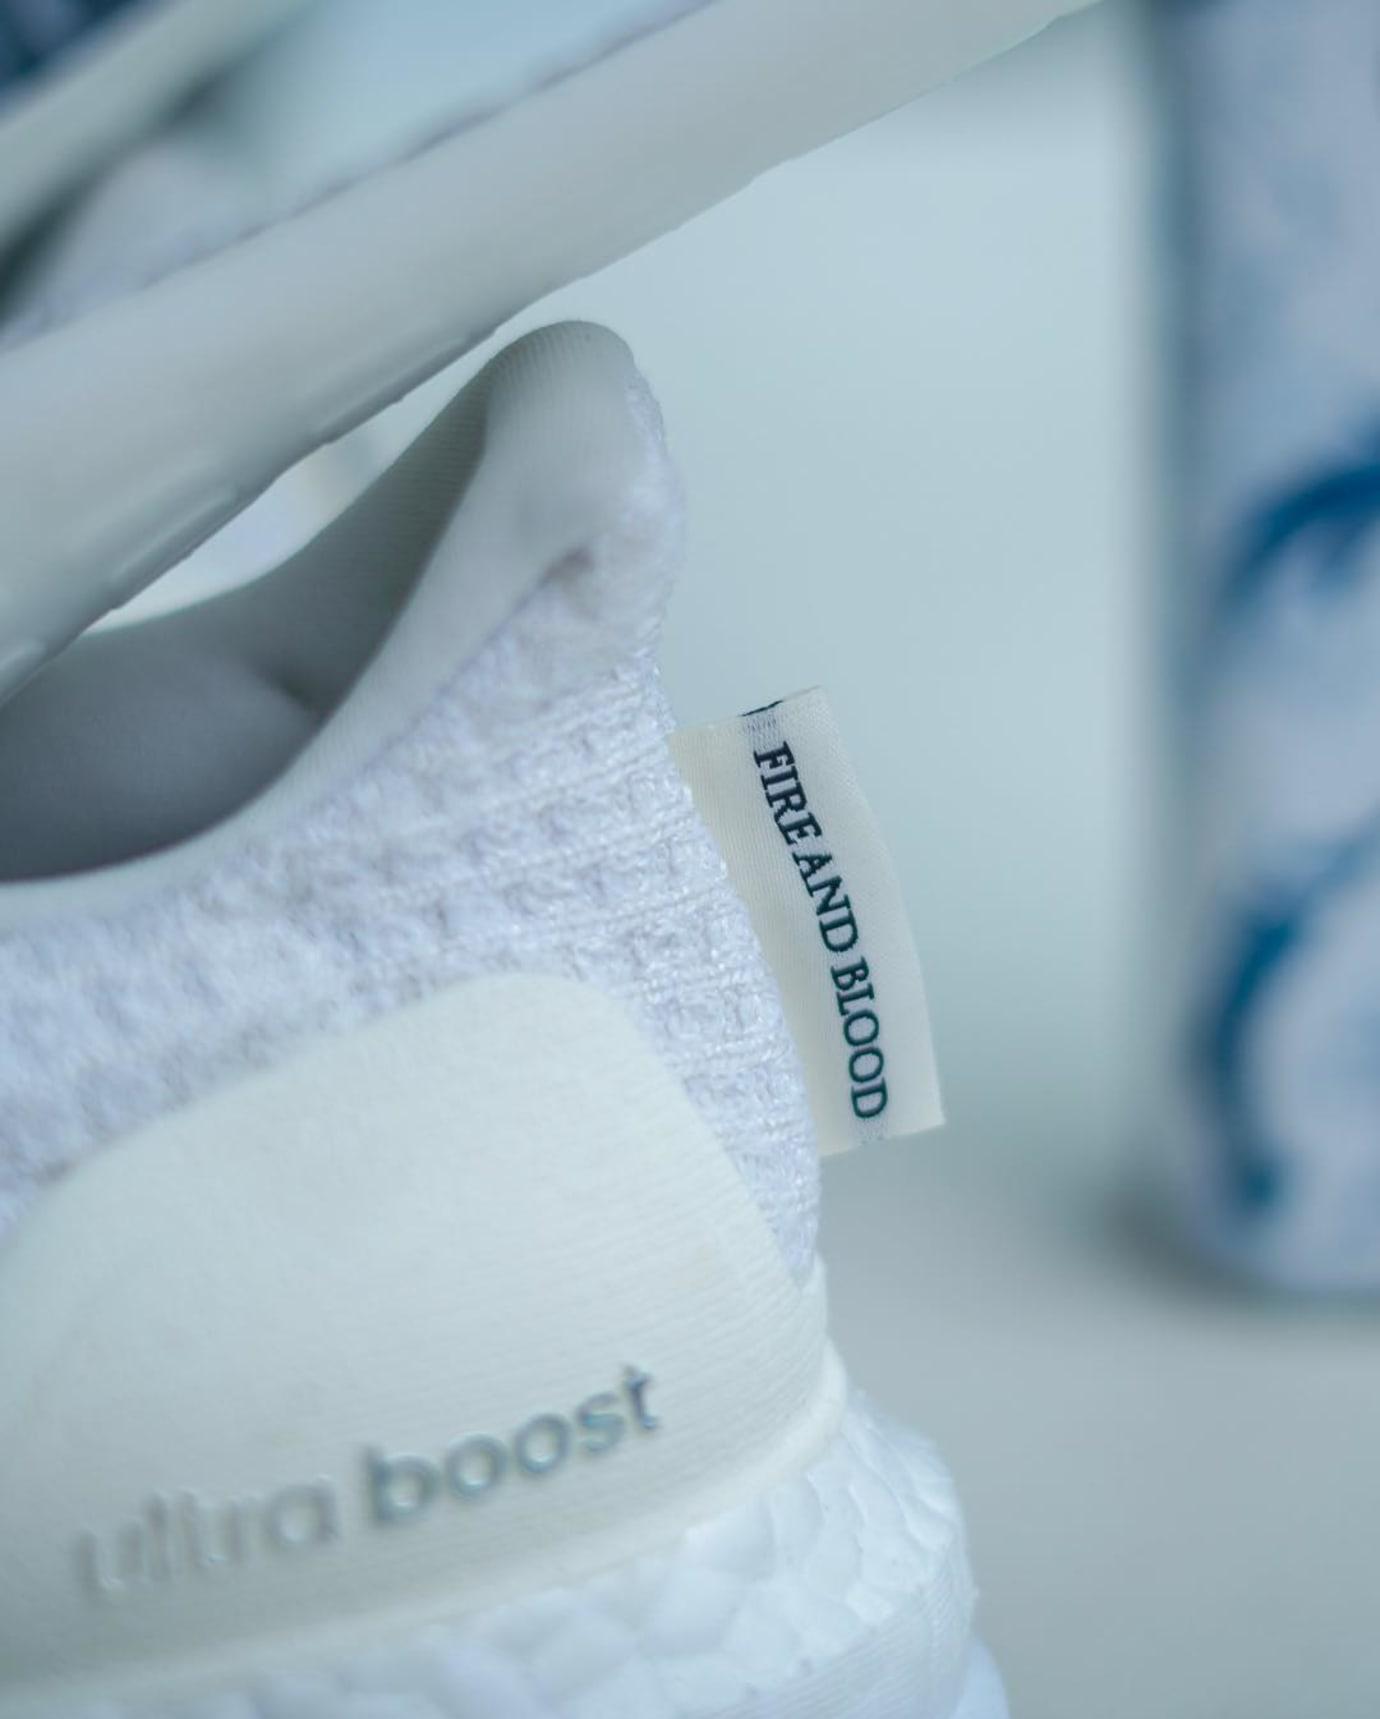 game-of-thrones-adidas-ultra-boost-4-0-house-of-targaryen-heel-tag